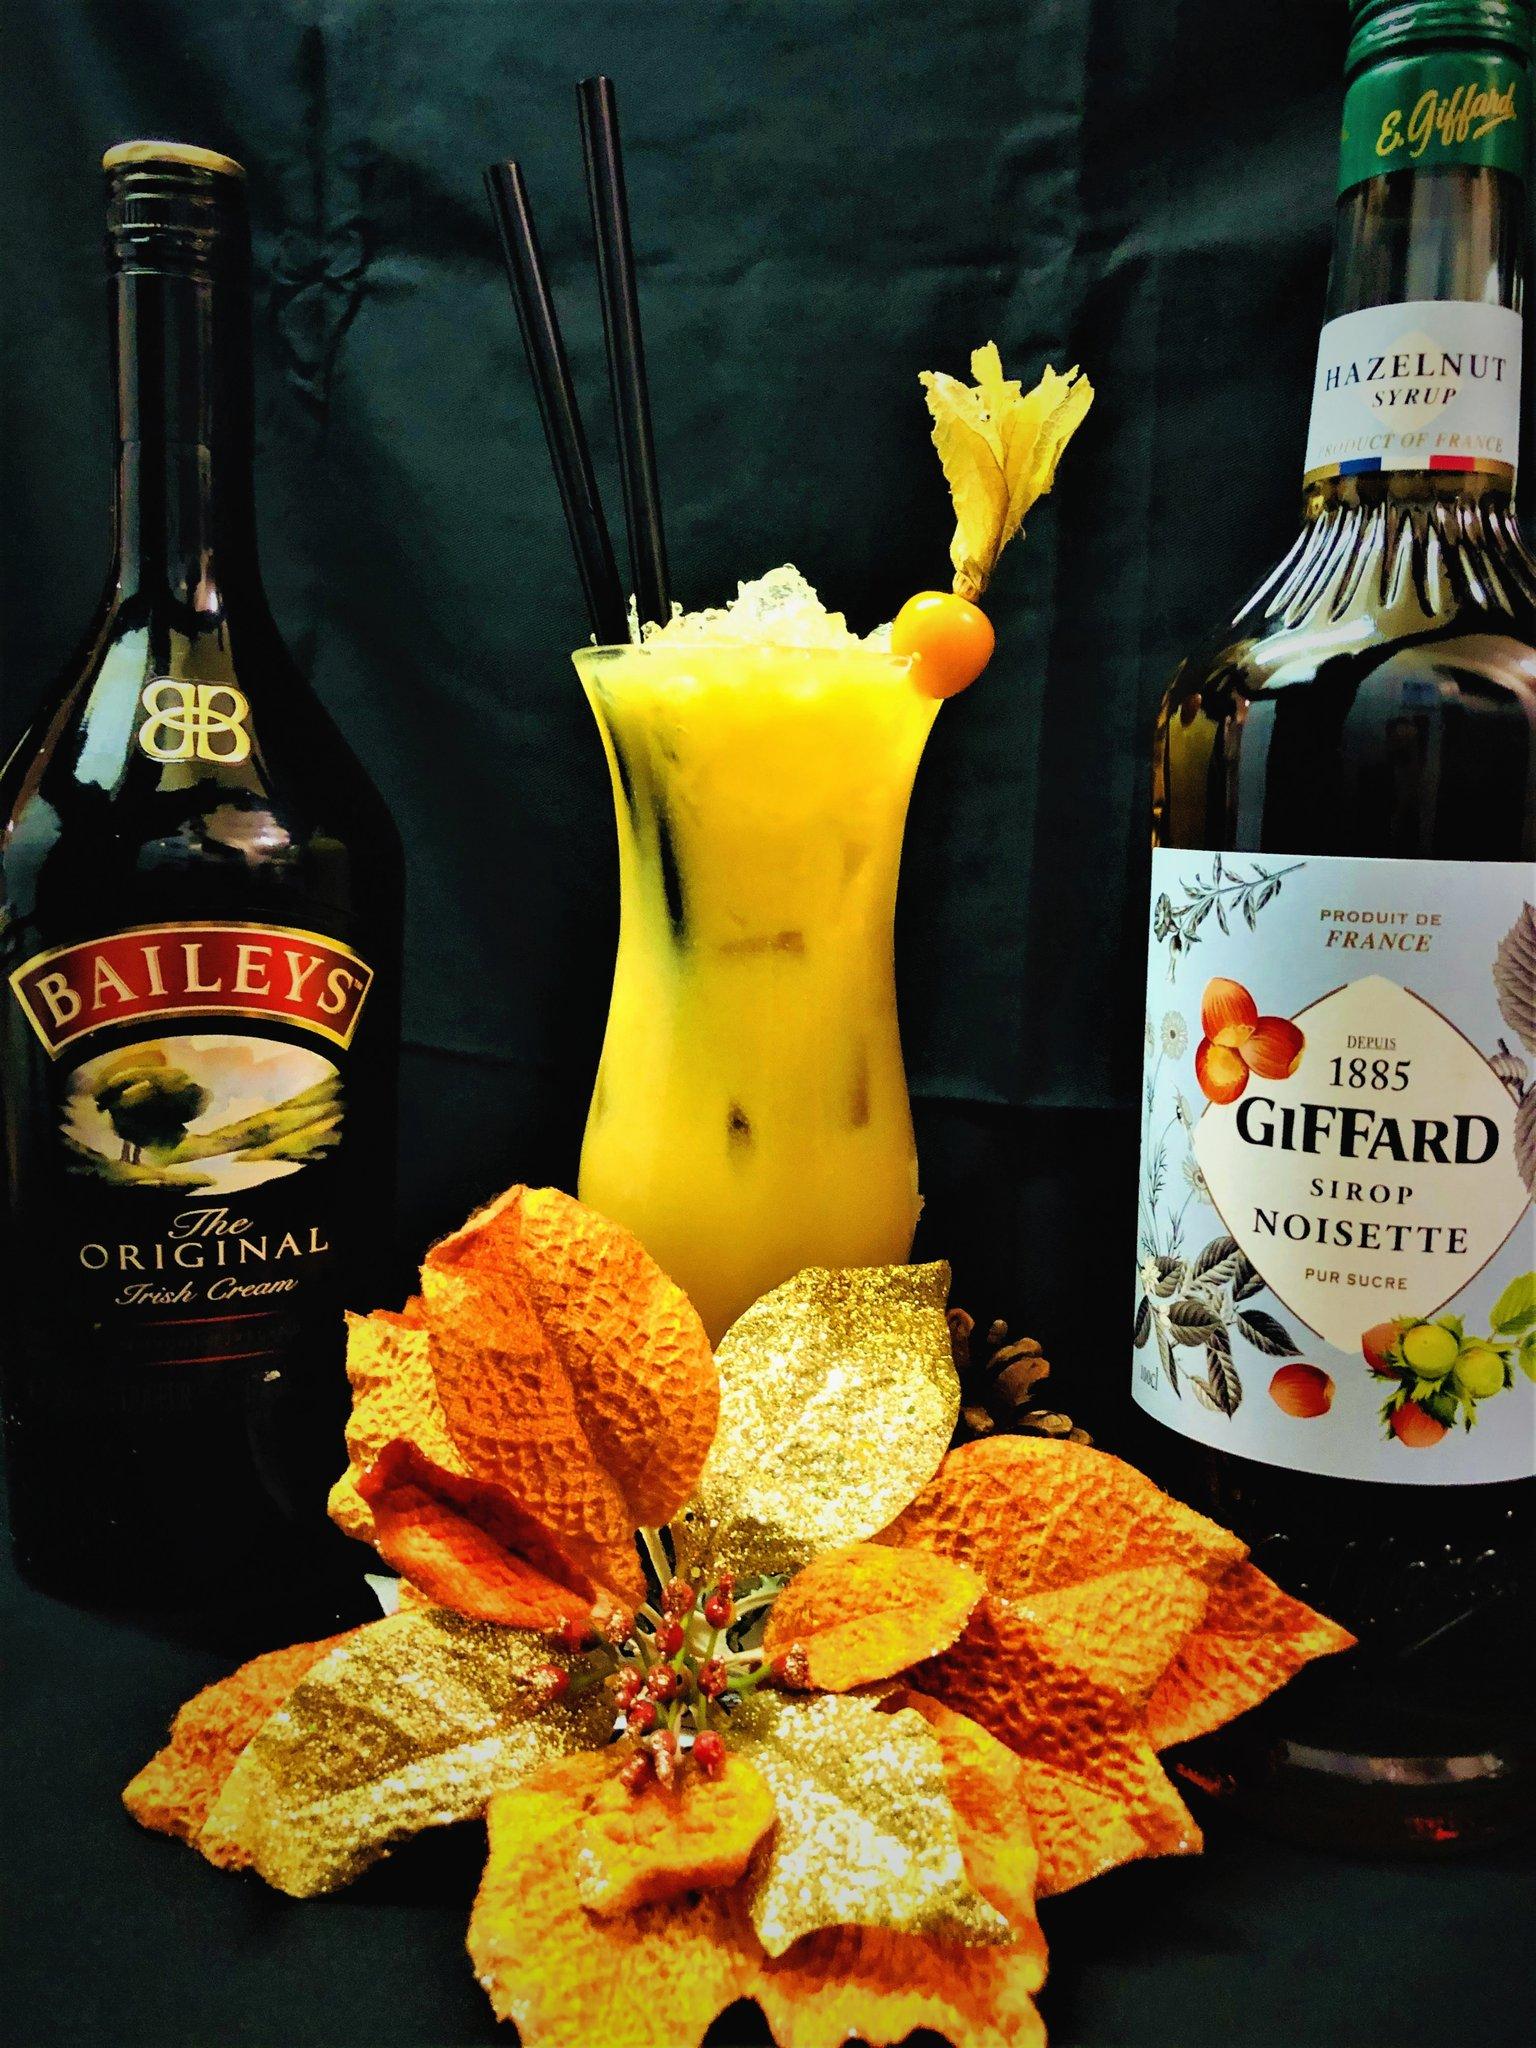 Sunday fun 😁🍹 Hazelnut Colada with Bailey's, Giffard Hazelnut Syrup, cream and Mango Juice🍹👍yummy #cocktail #mixology #happyhour @totc @MacCocktail @DemiCassiani @winewankers @thecocktailguru @BaileysOfficial @GiffardLiqueurs @Natascocktails https://t.co/0jZX6ytOWp